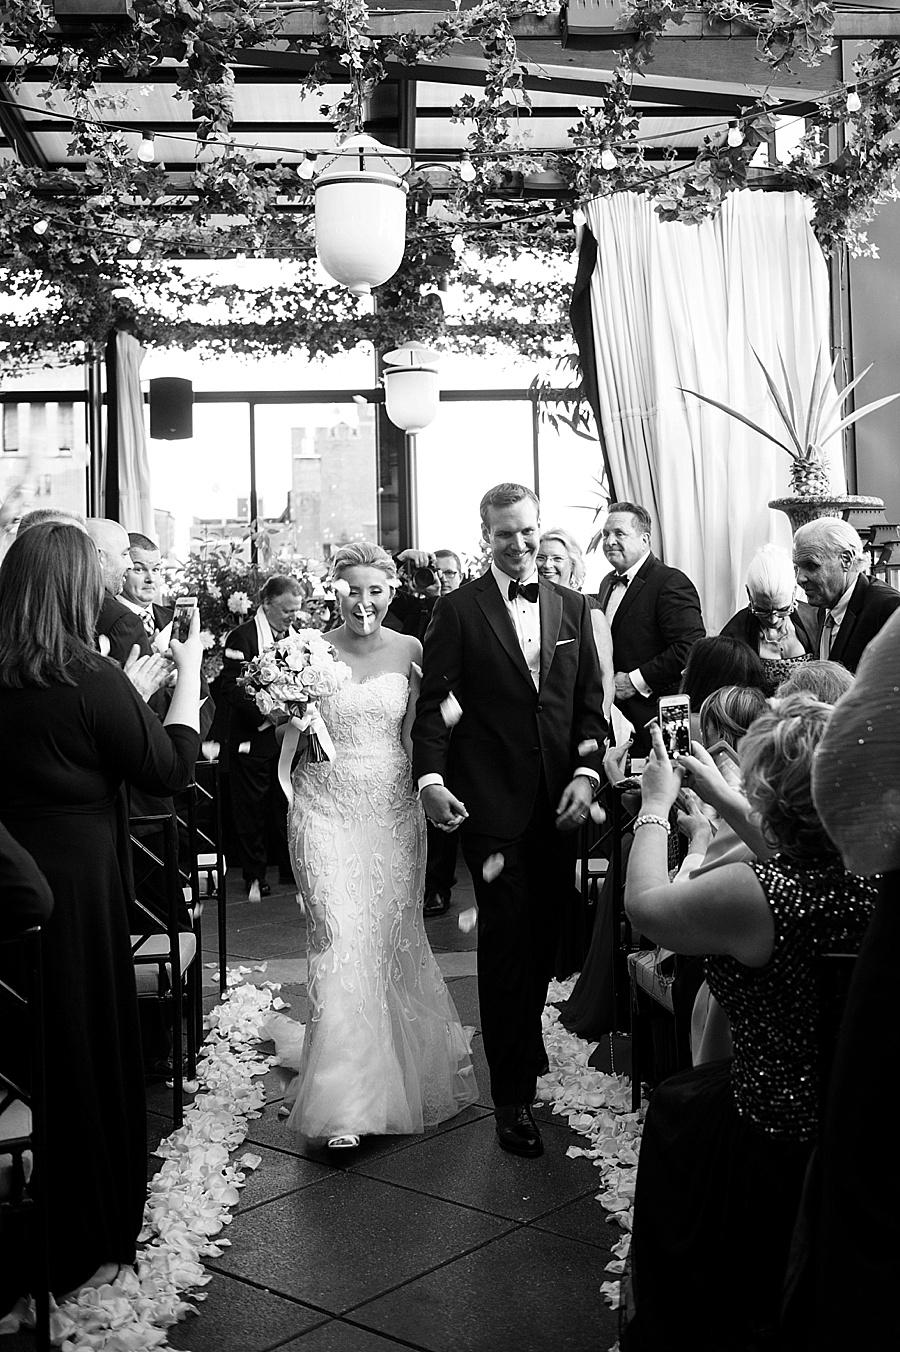 Gramercy_Park_Hotel_Wedding_033.jpg